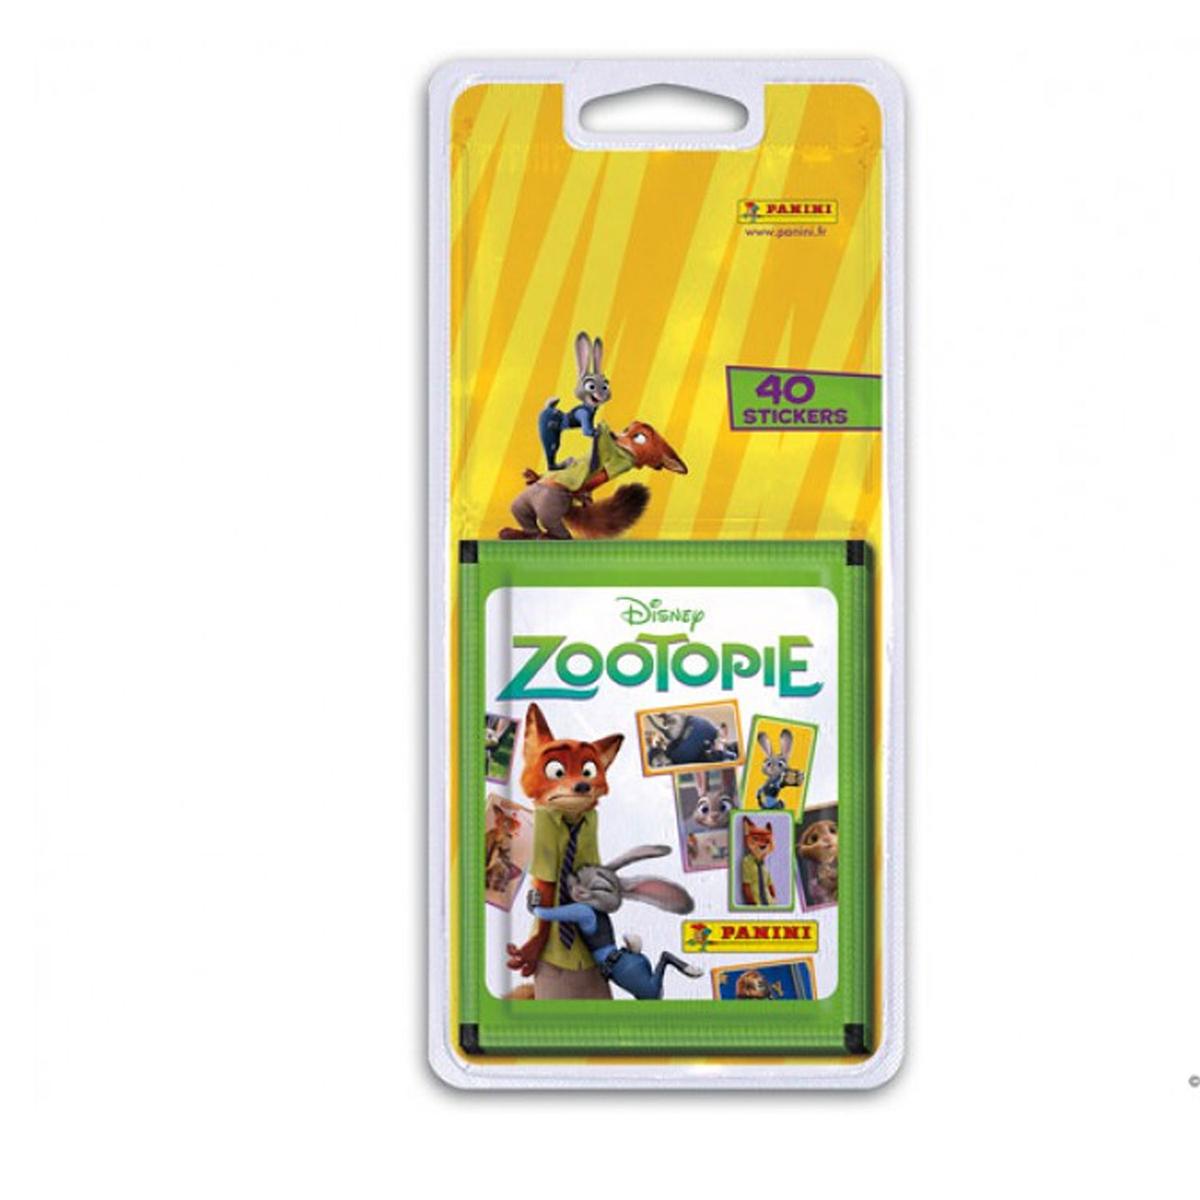 40 stickers Panini - Zootopie - 8 pochettes